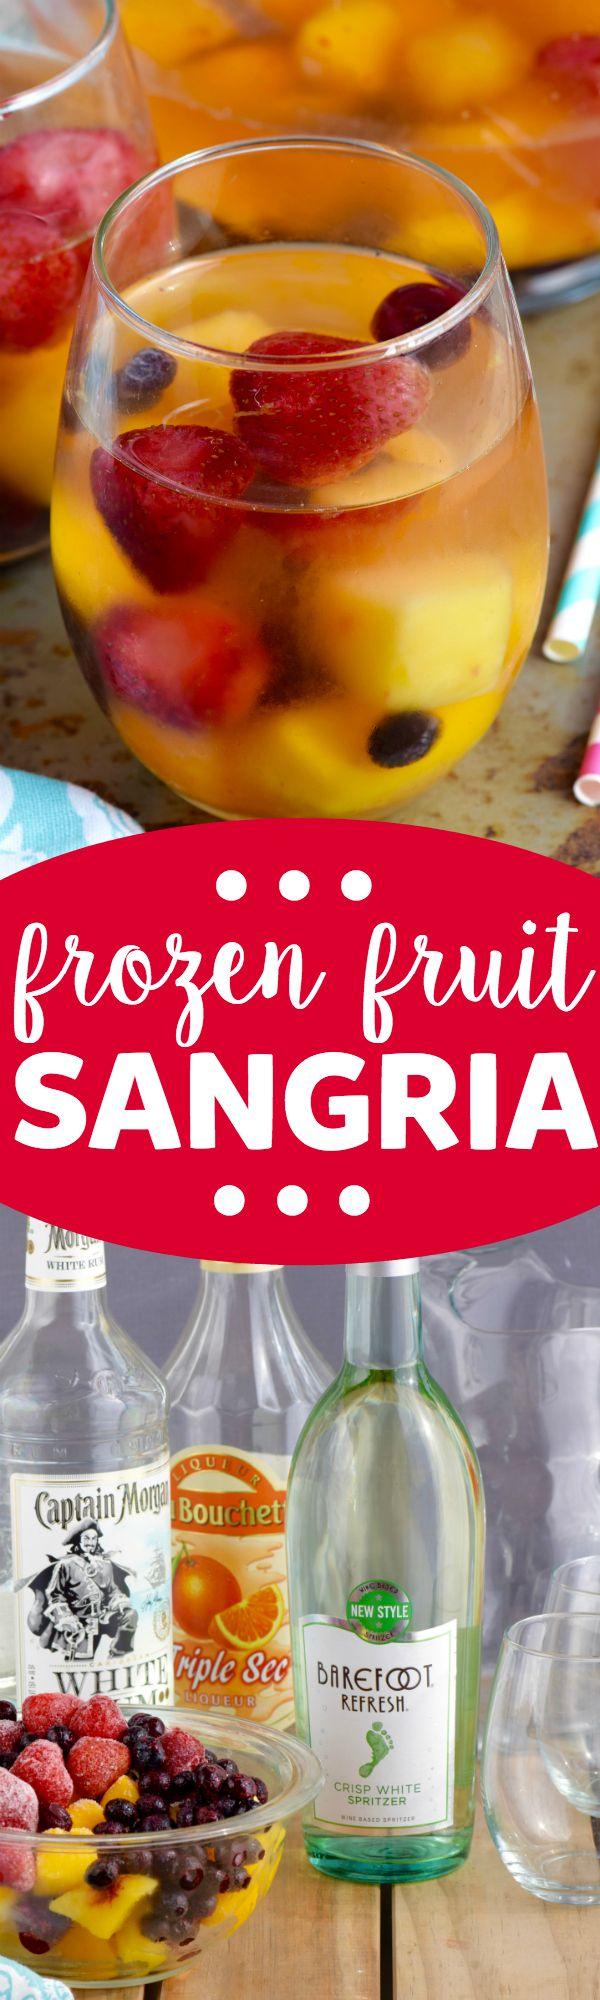 Frozen Fruit Sangria Wine Glue Fruit Sangria Frozen Fruit Fruit Cocktails